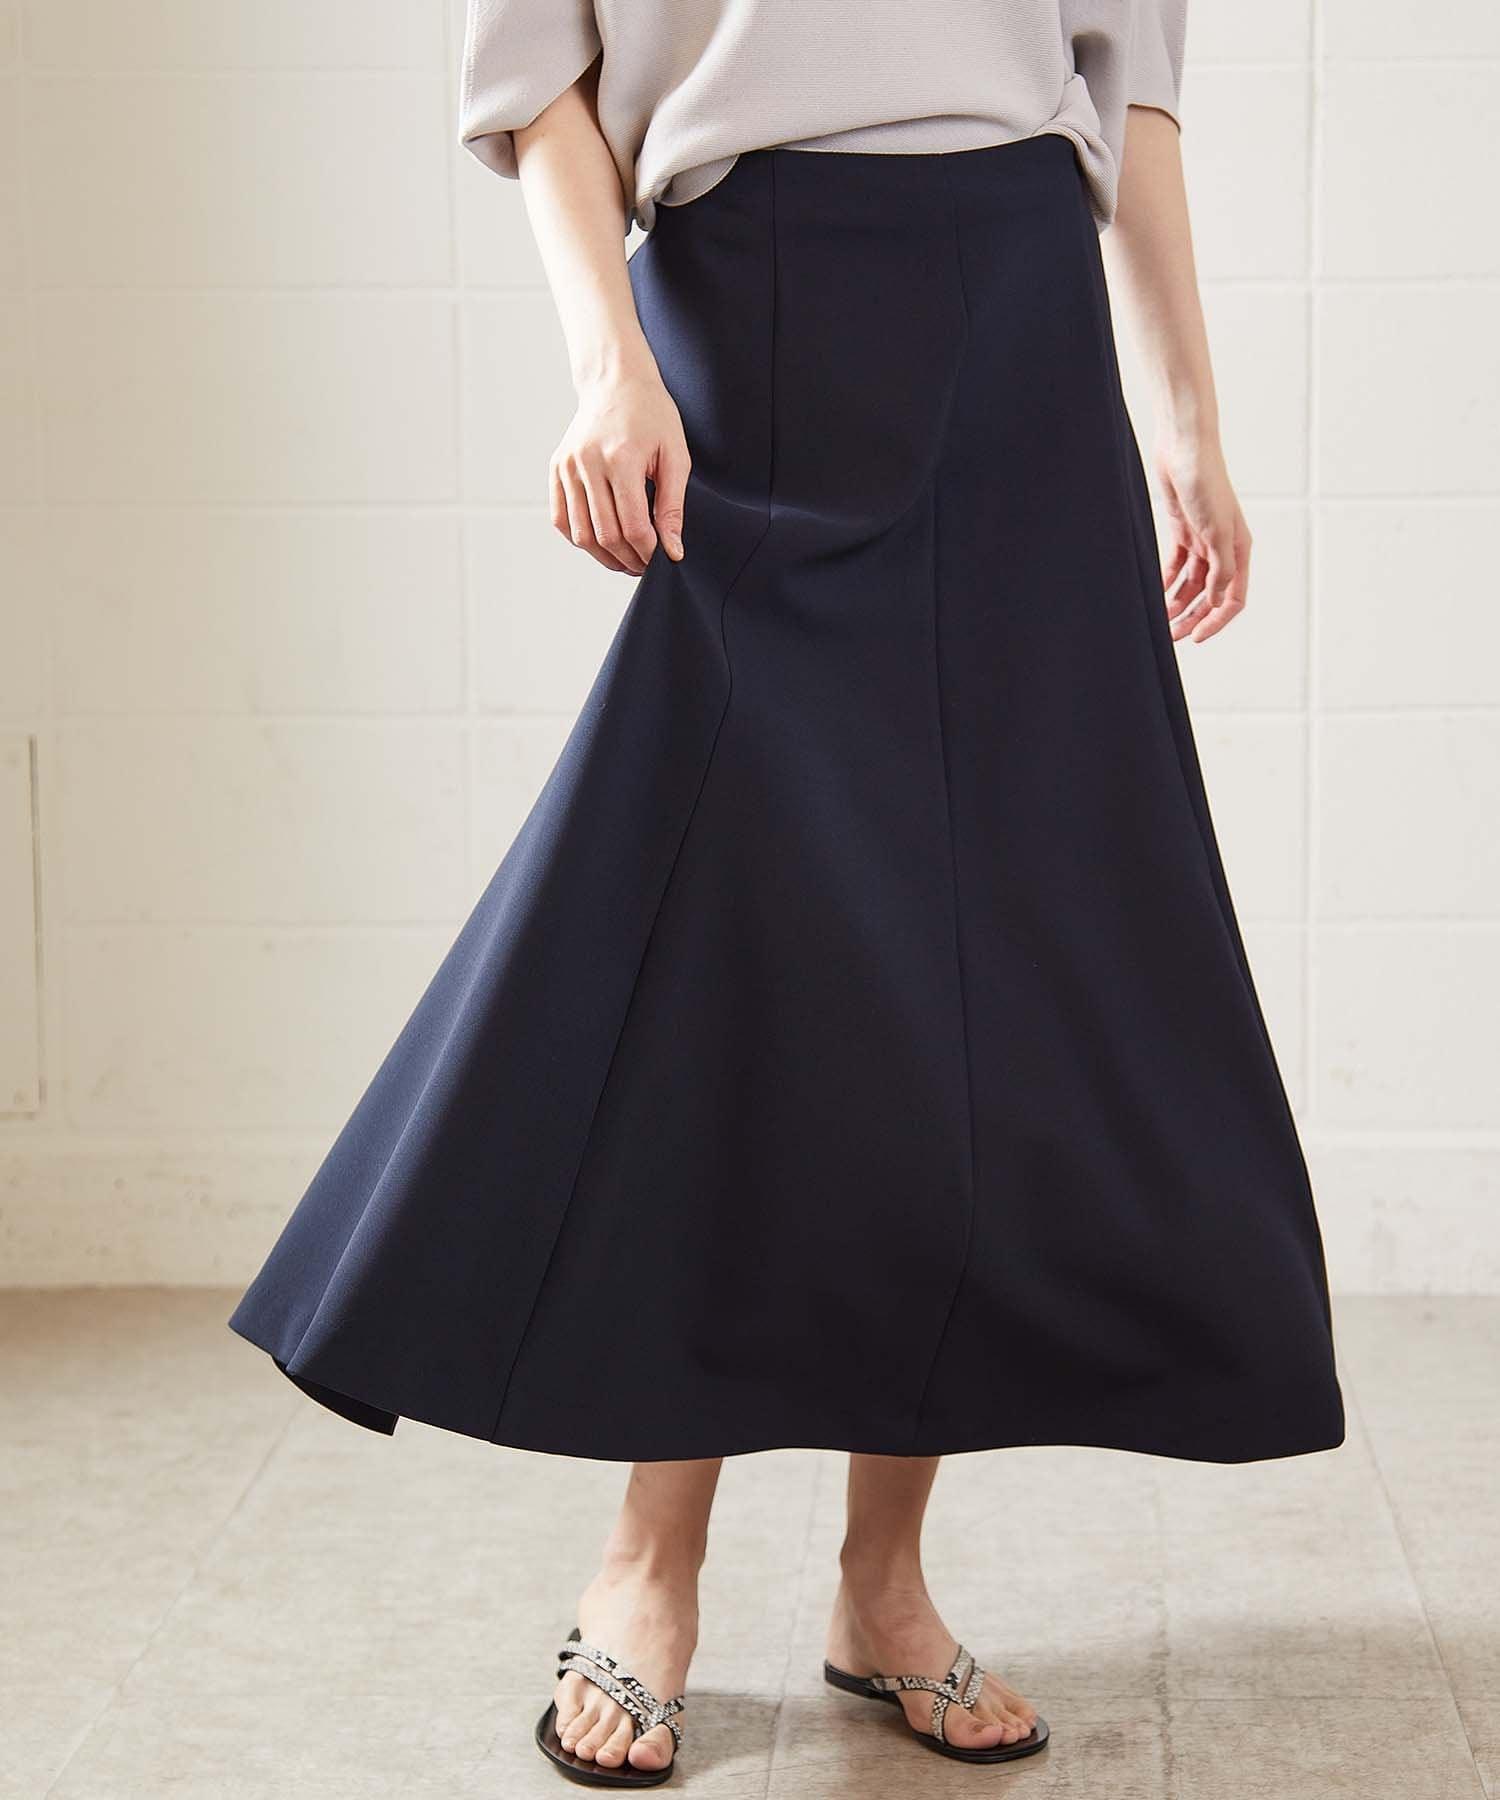 OUVRAGE CLASSE(ウヴラージュクラス) ダブルクロス切替フレアスカート